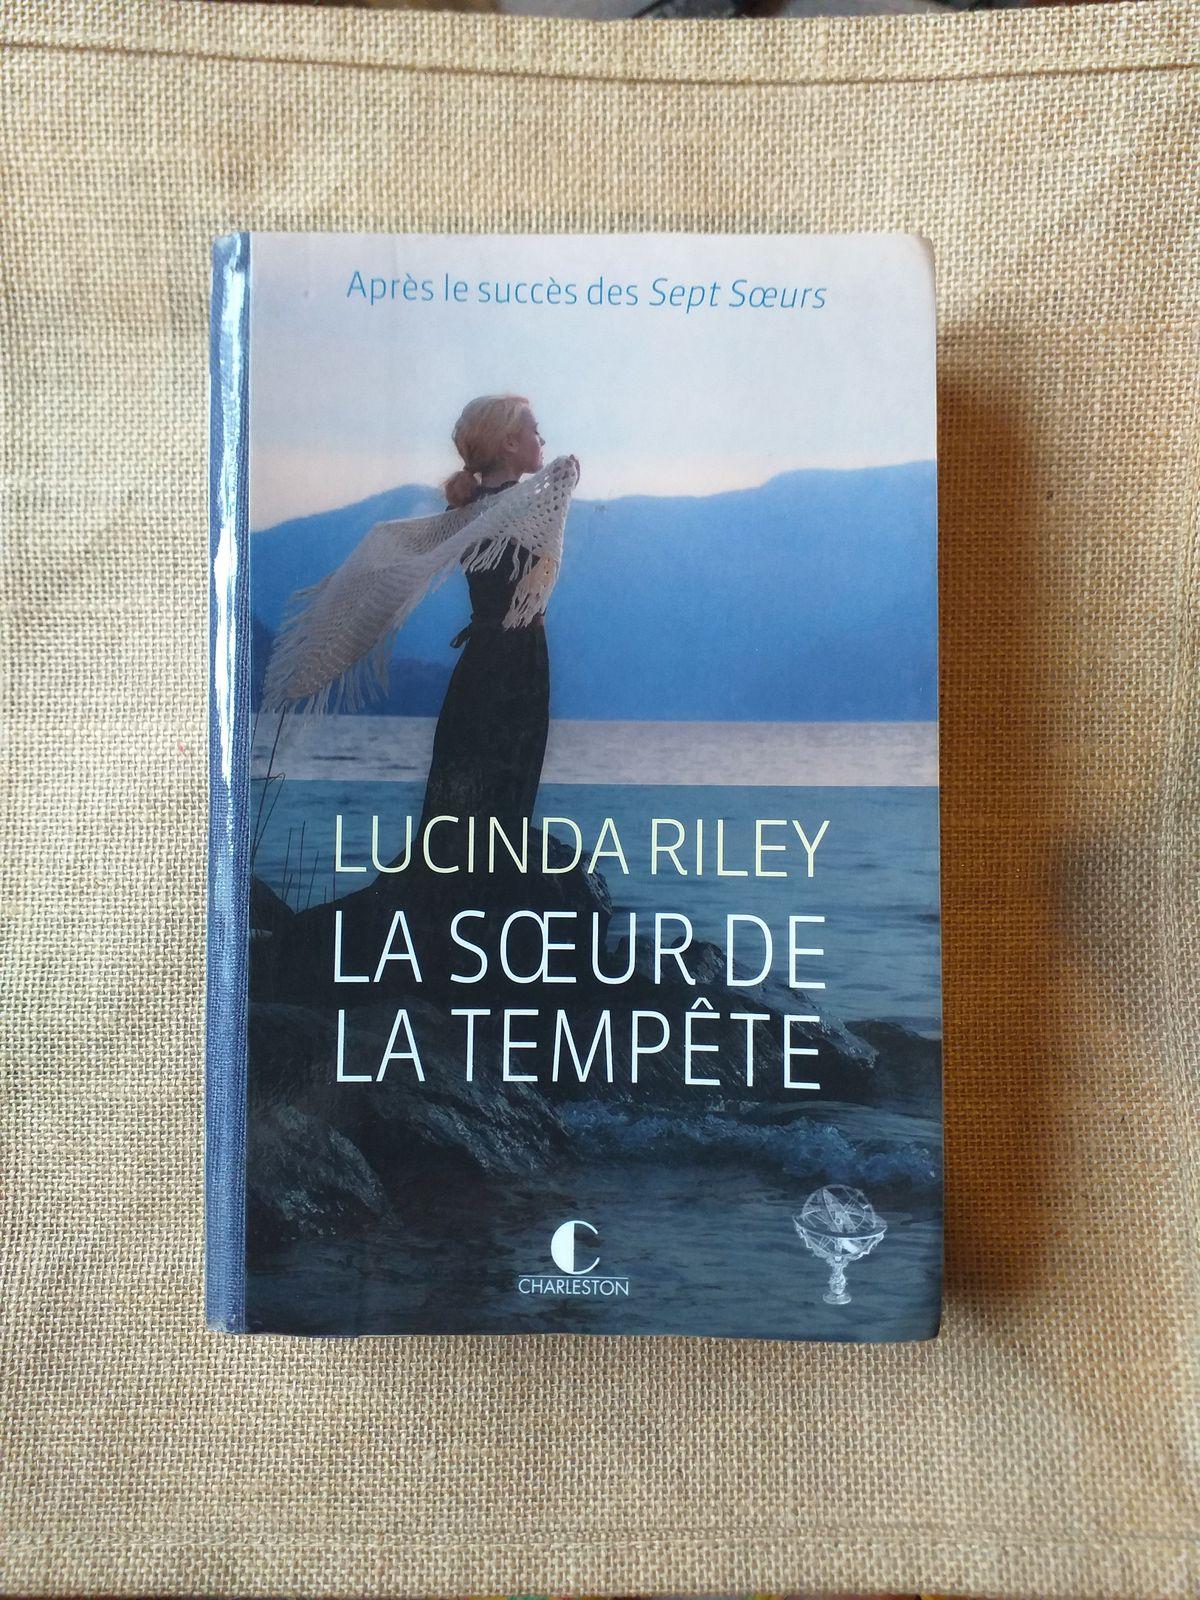 Les sept sœurs, tome 2 : Ally, la sœur de la tempête de Lucinda Riley